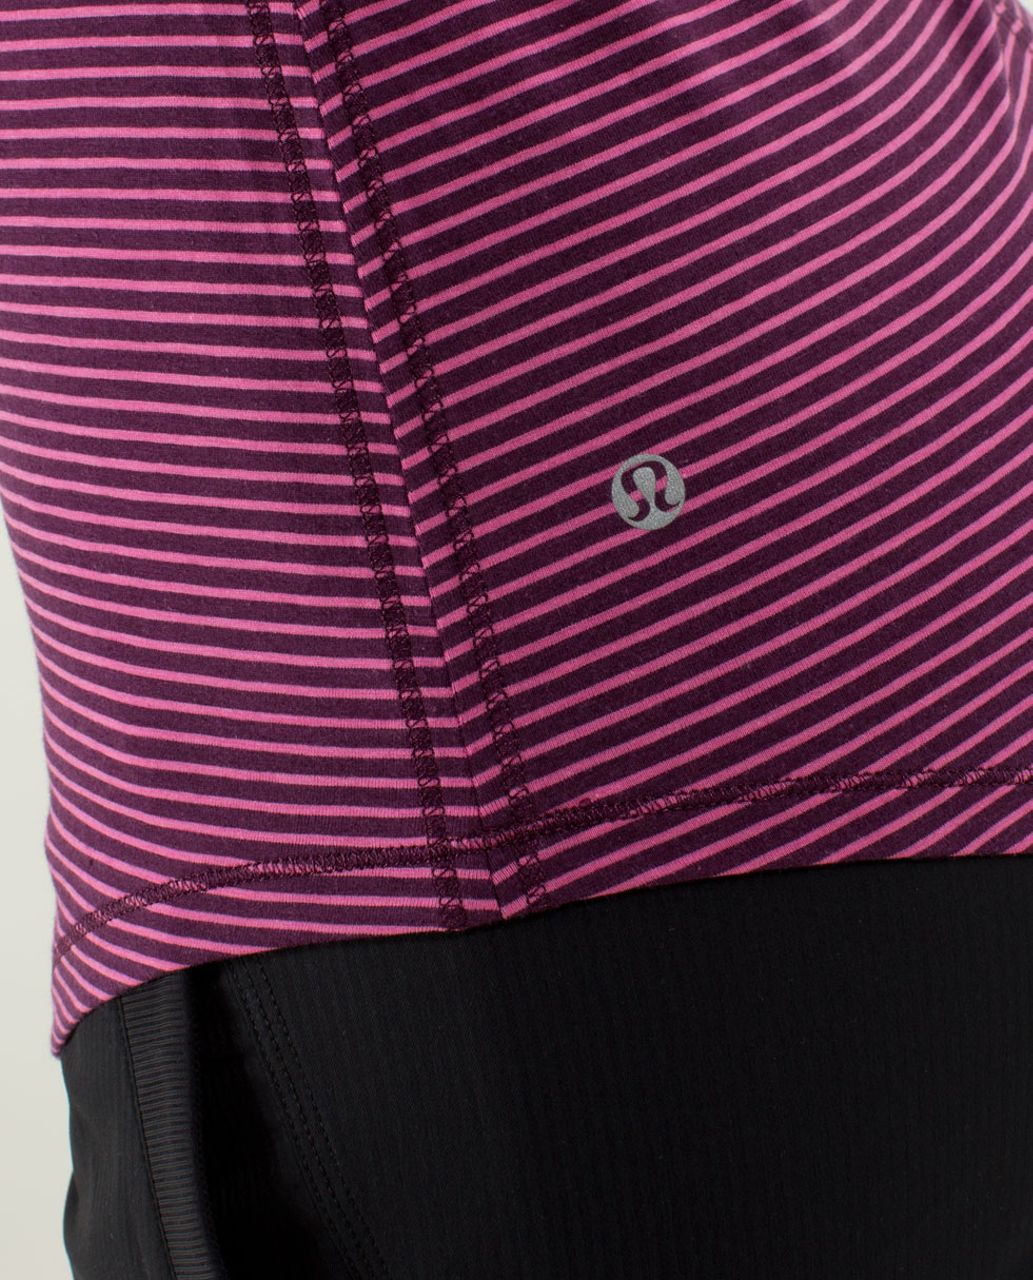 Lululemon Karma Long Sleeve - Hyper Stripe Afterglo